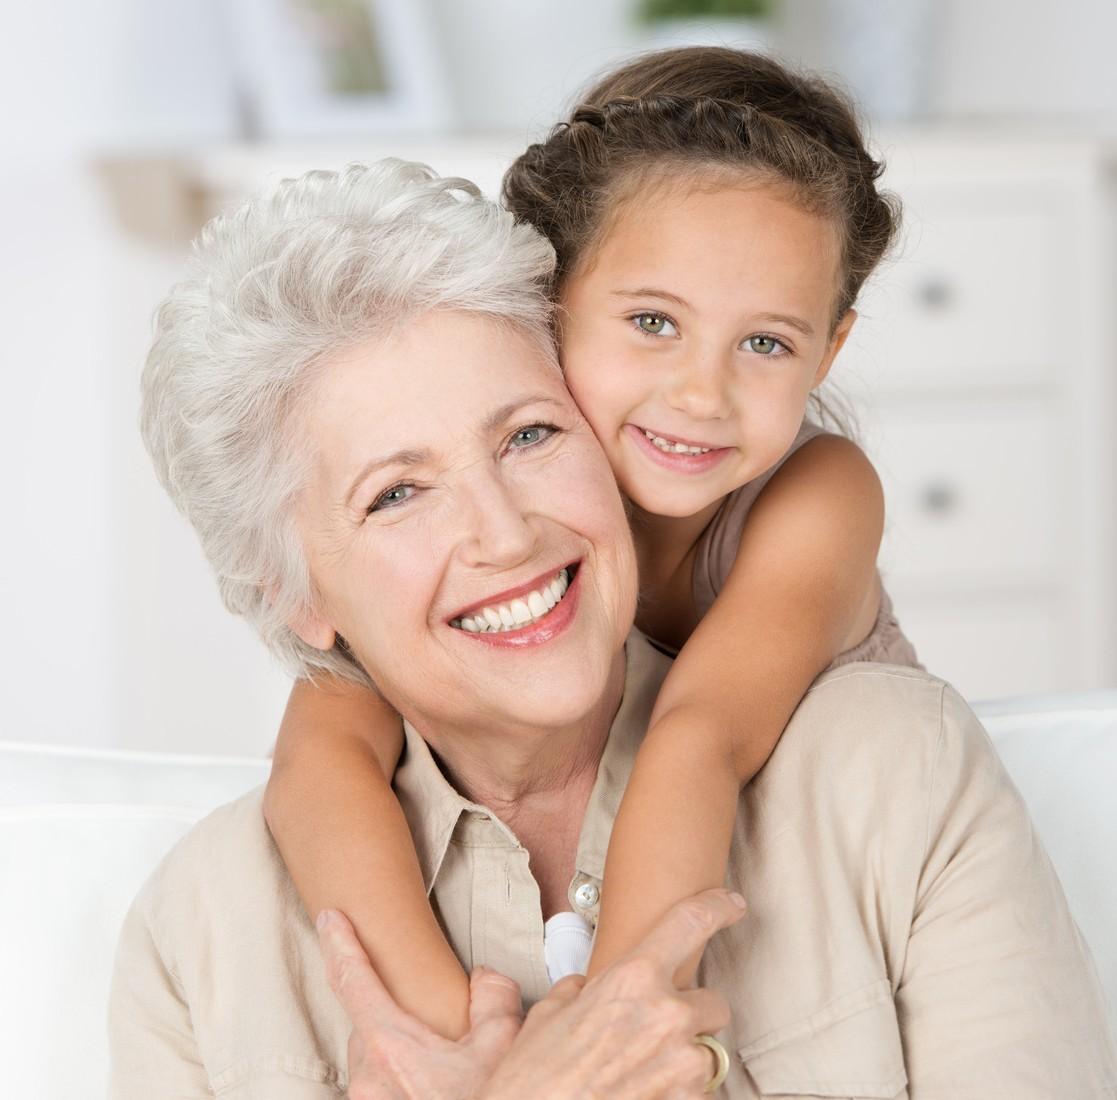 enkelin umarmt ihre oma